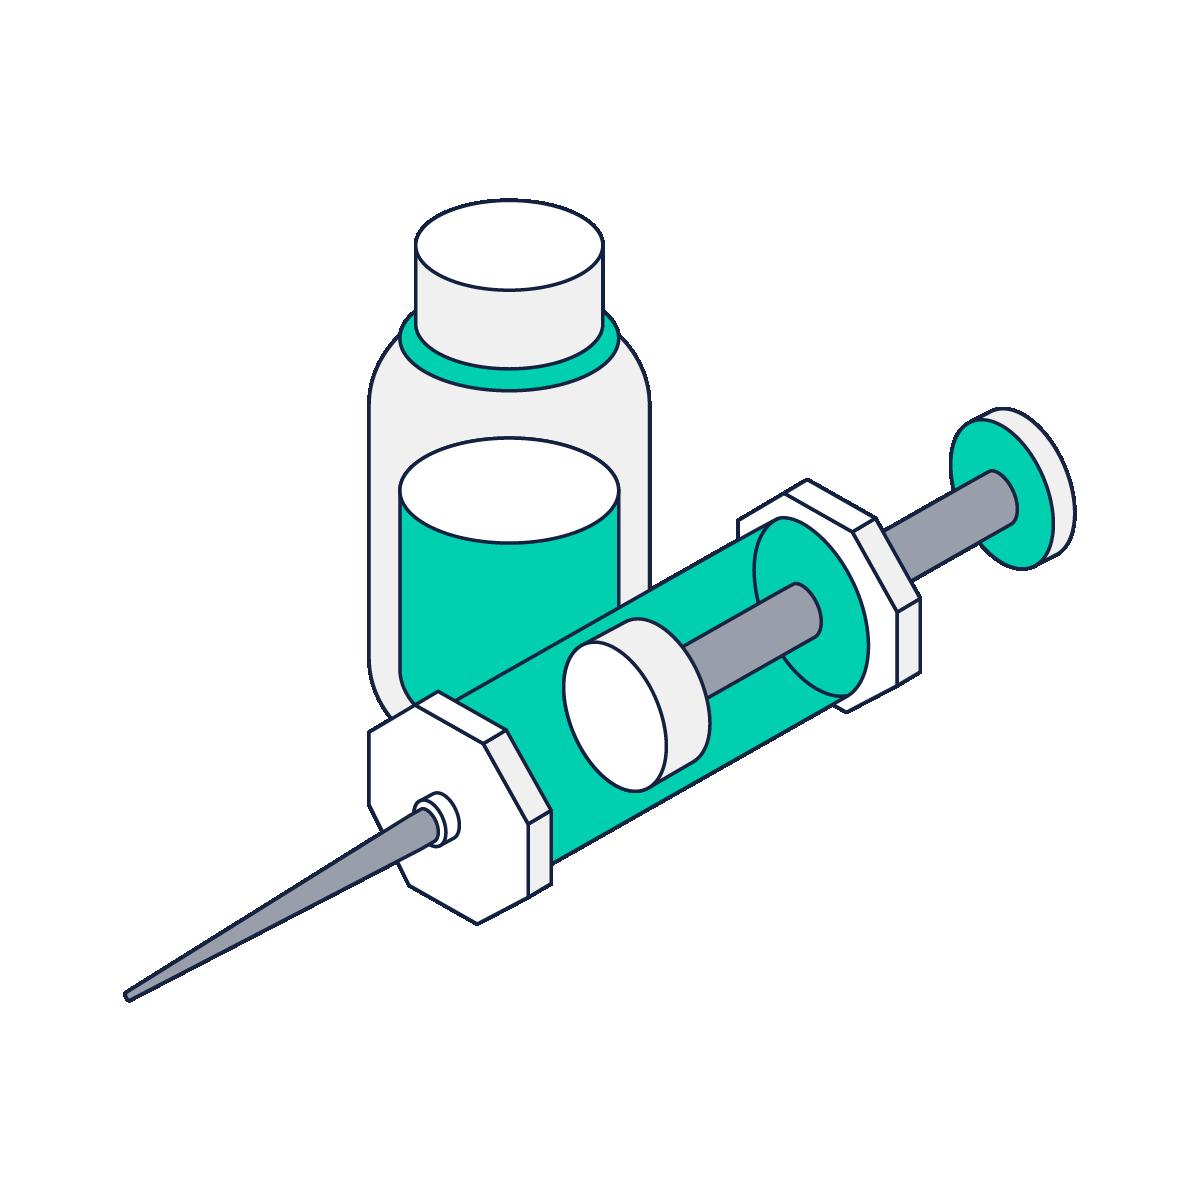 7bridges vaccine icon